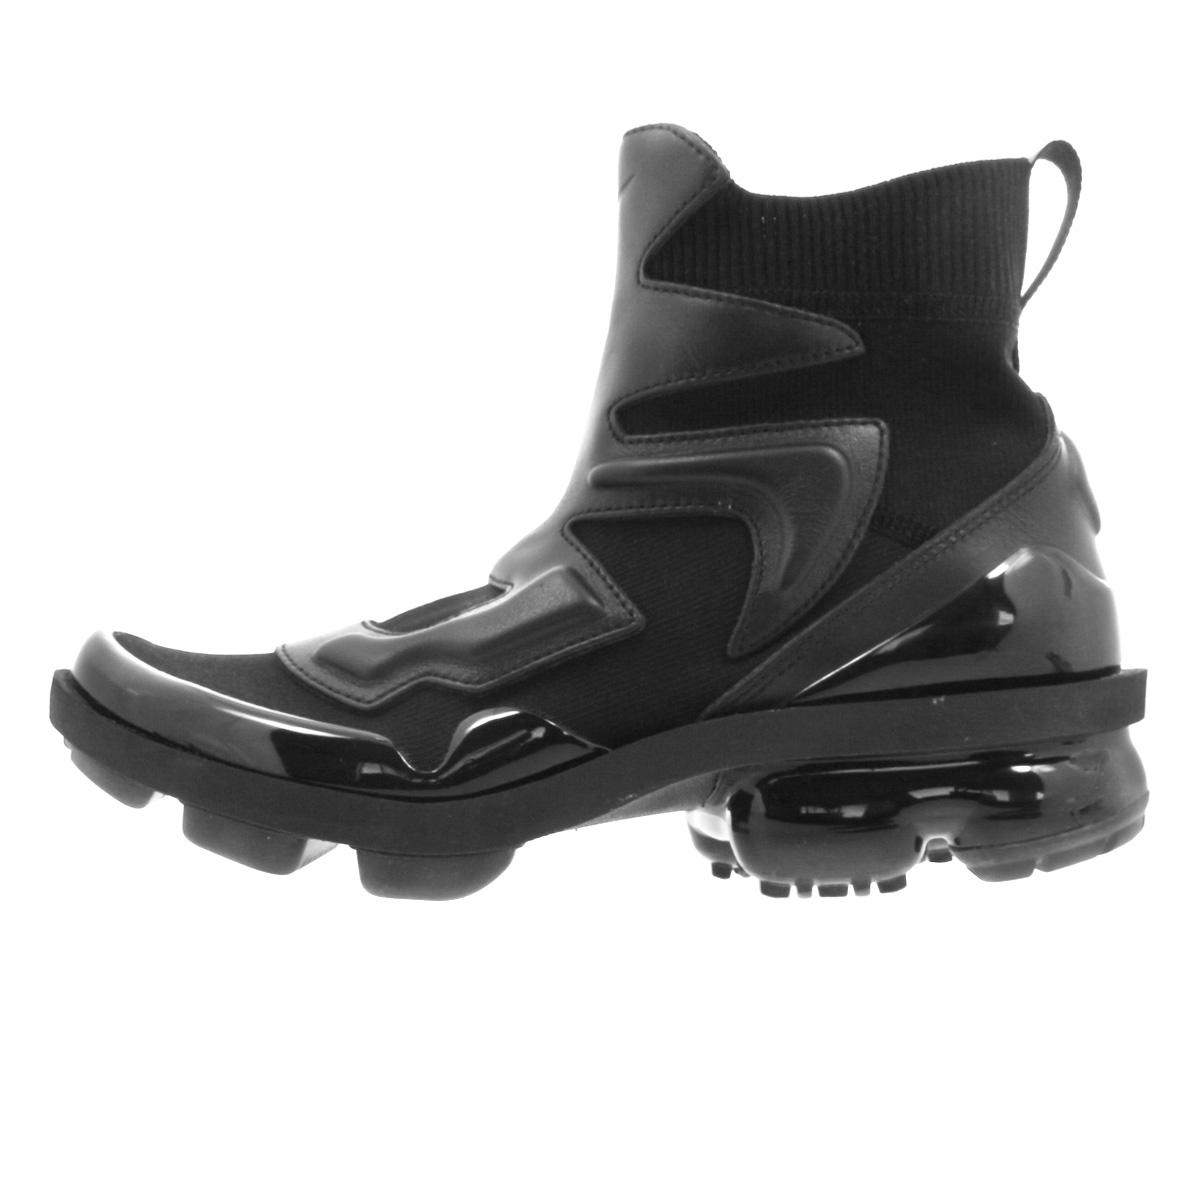 f5db2cb643c NIKE WMNS AIR VAPORMAX LIGHT II Nike women air vapor max light 2 BLACK BLACK  BLACK ao4537-001